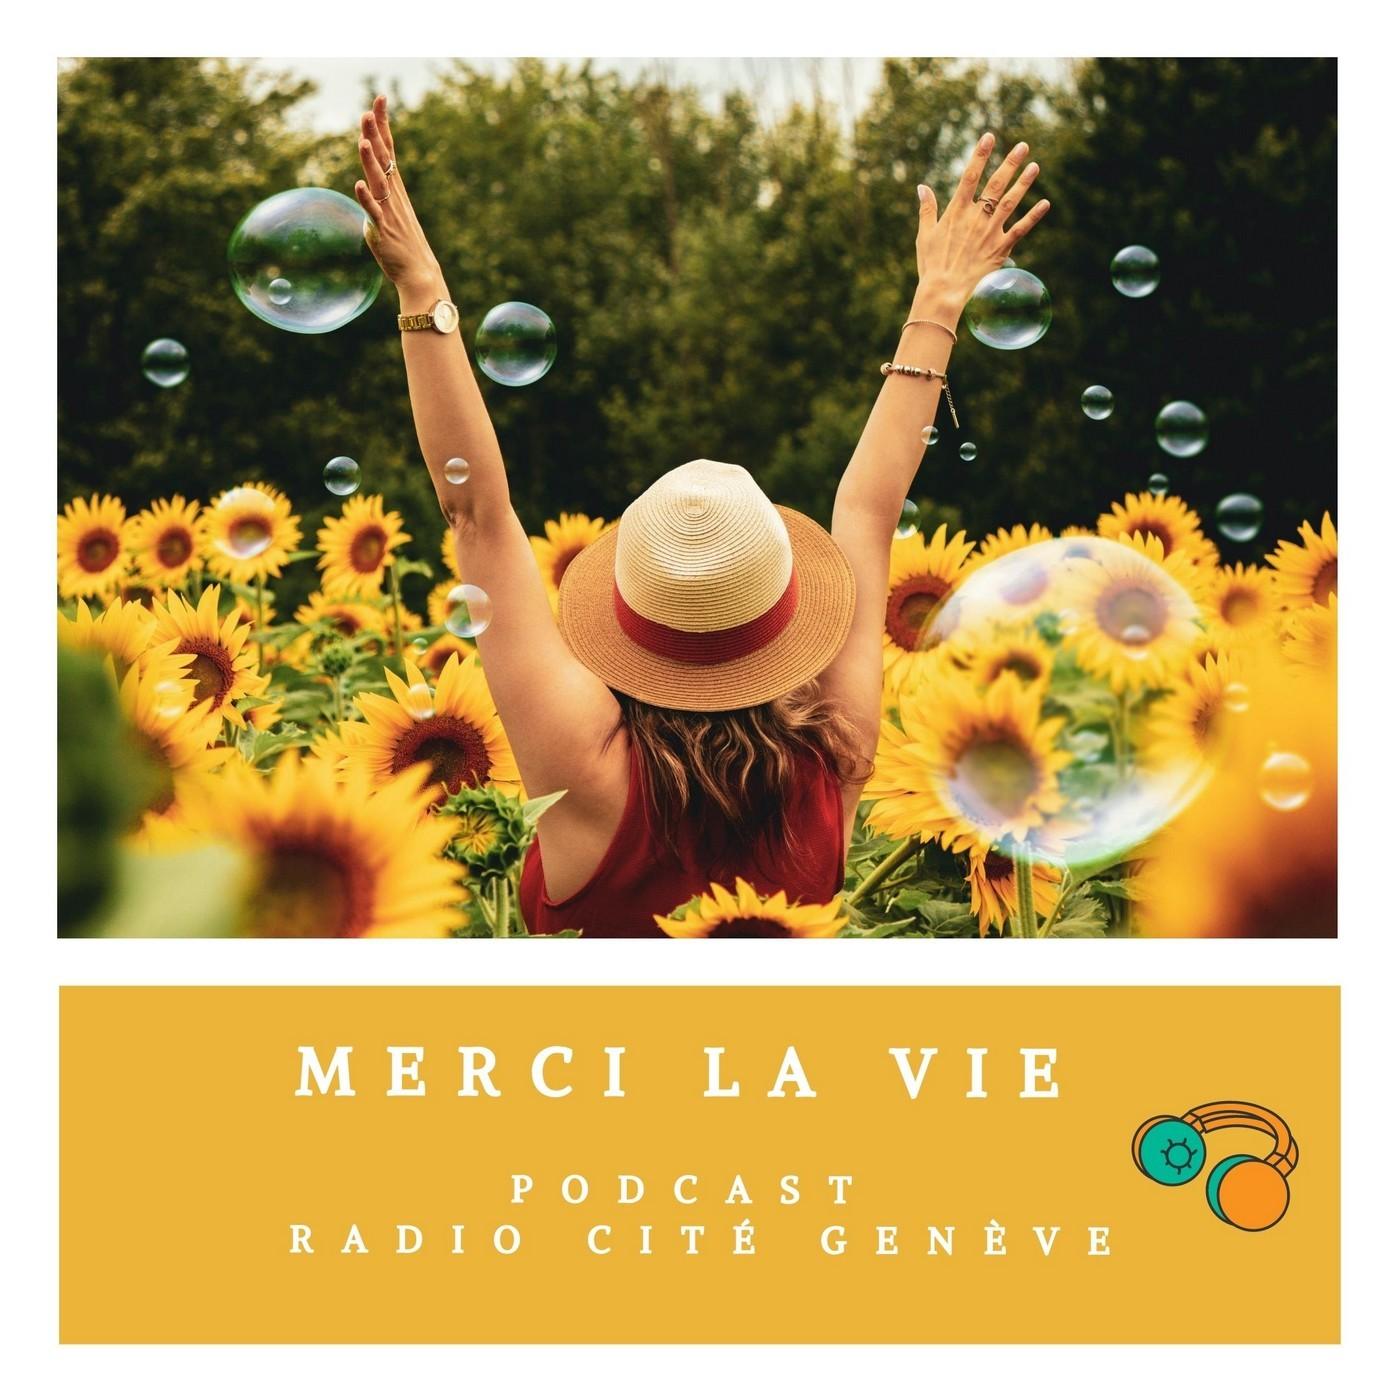 Merci la Vie du 16/03/21 - Marine Delévaux